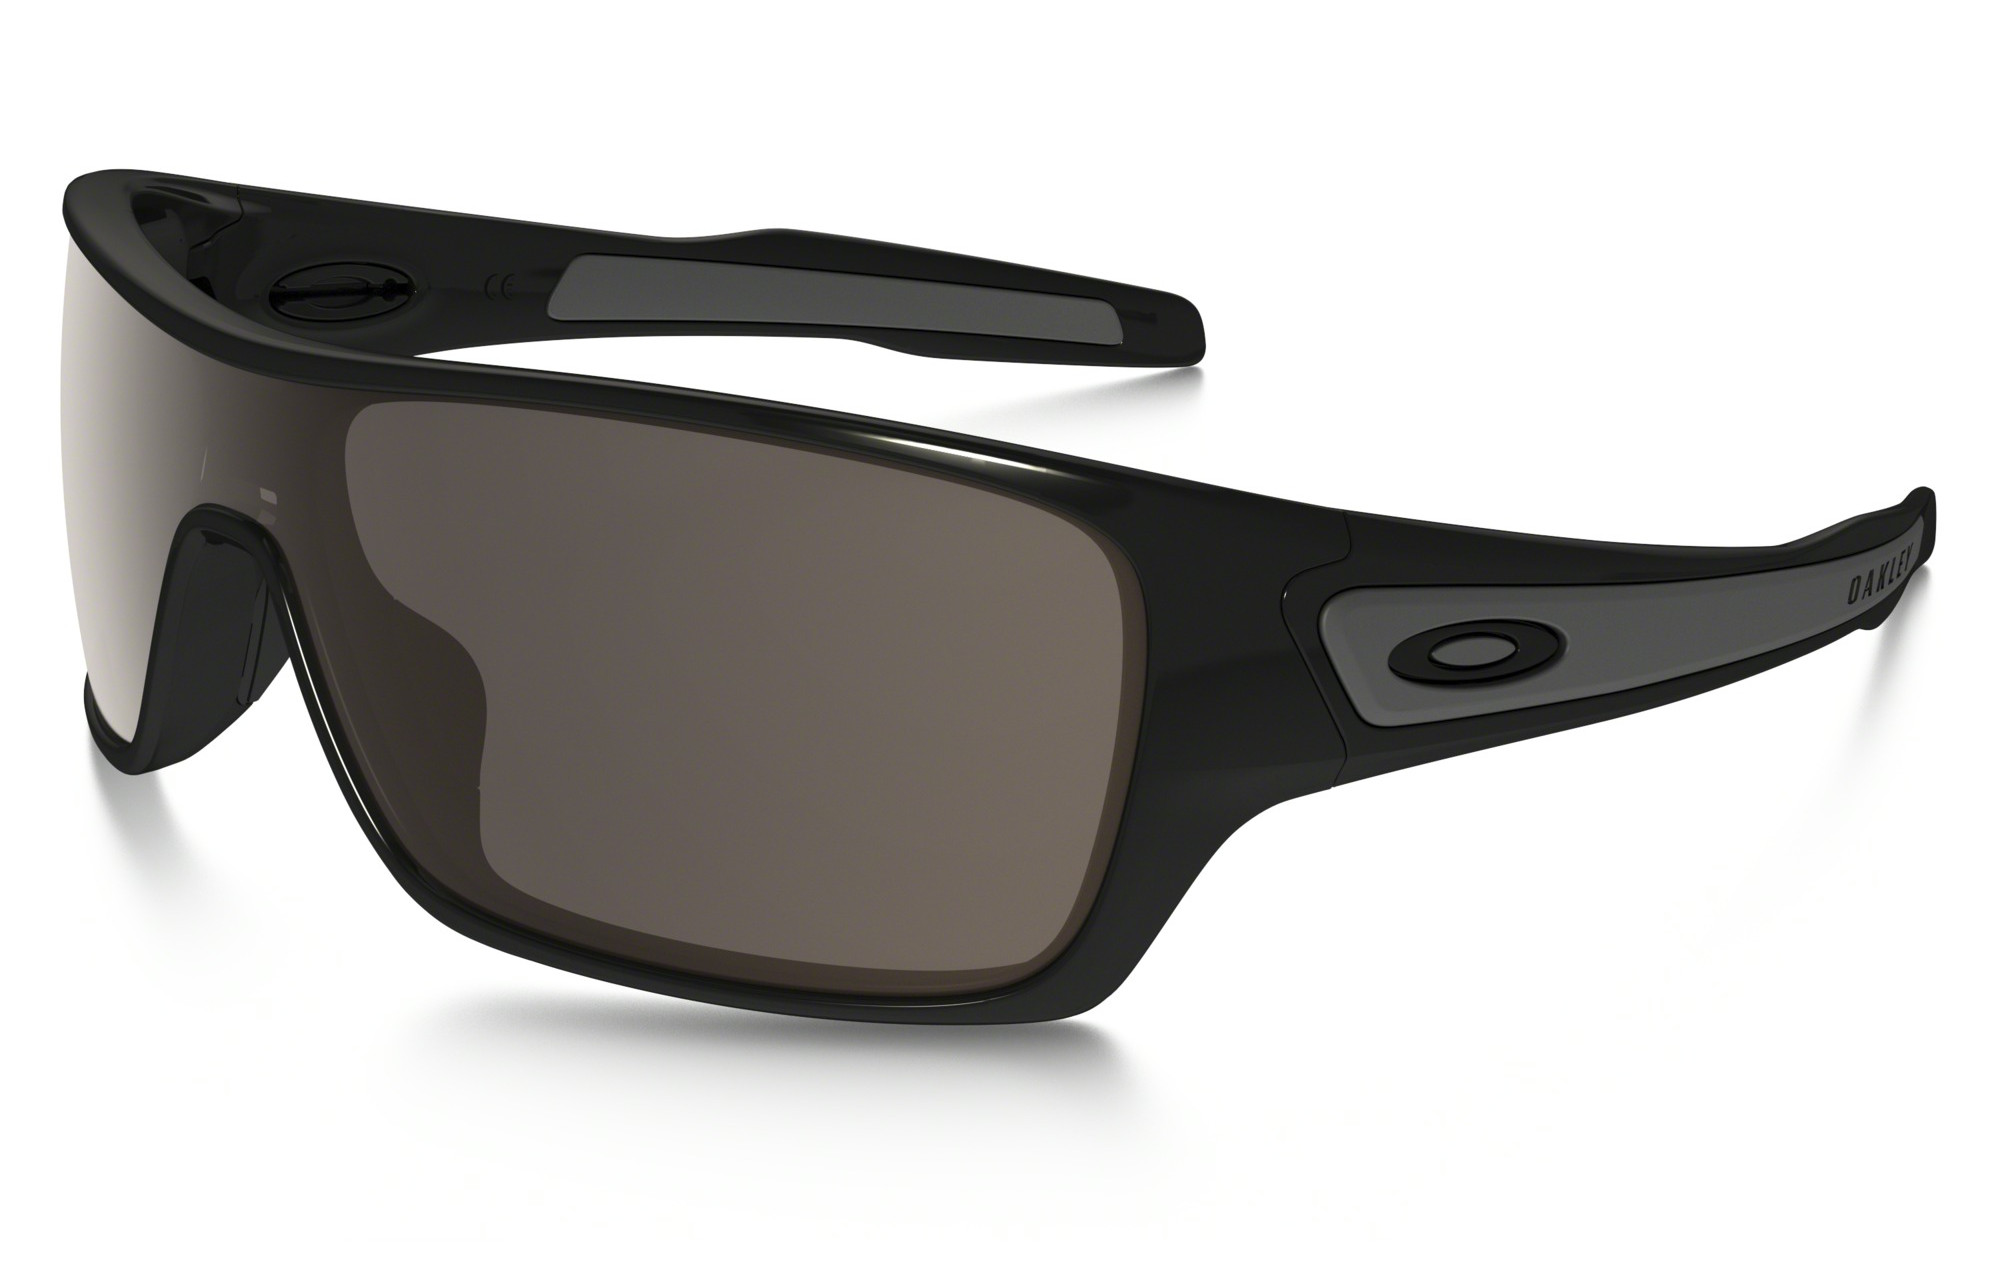 ab1ec4dc4a08 OAKLEY Sunglasses TURBINE ROTOR Black - Grey OO9307-01 | Alltricks.com